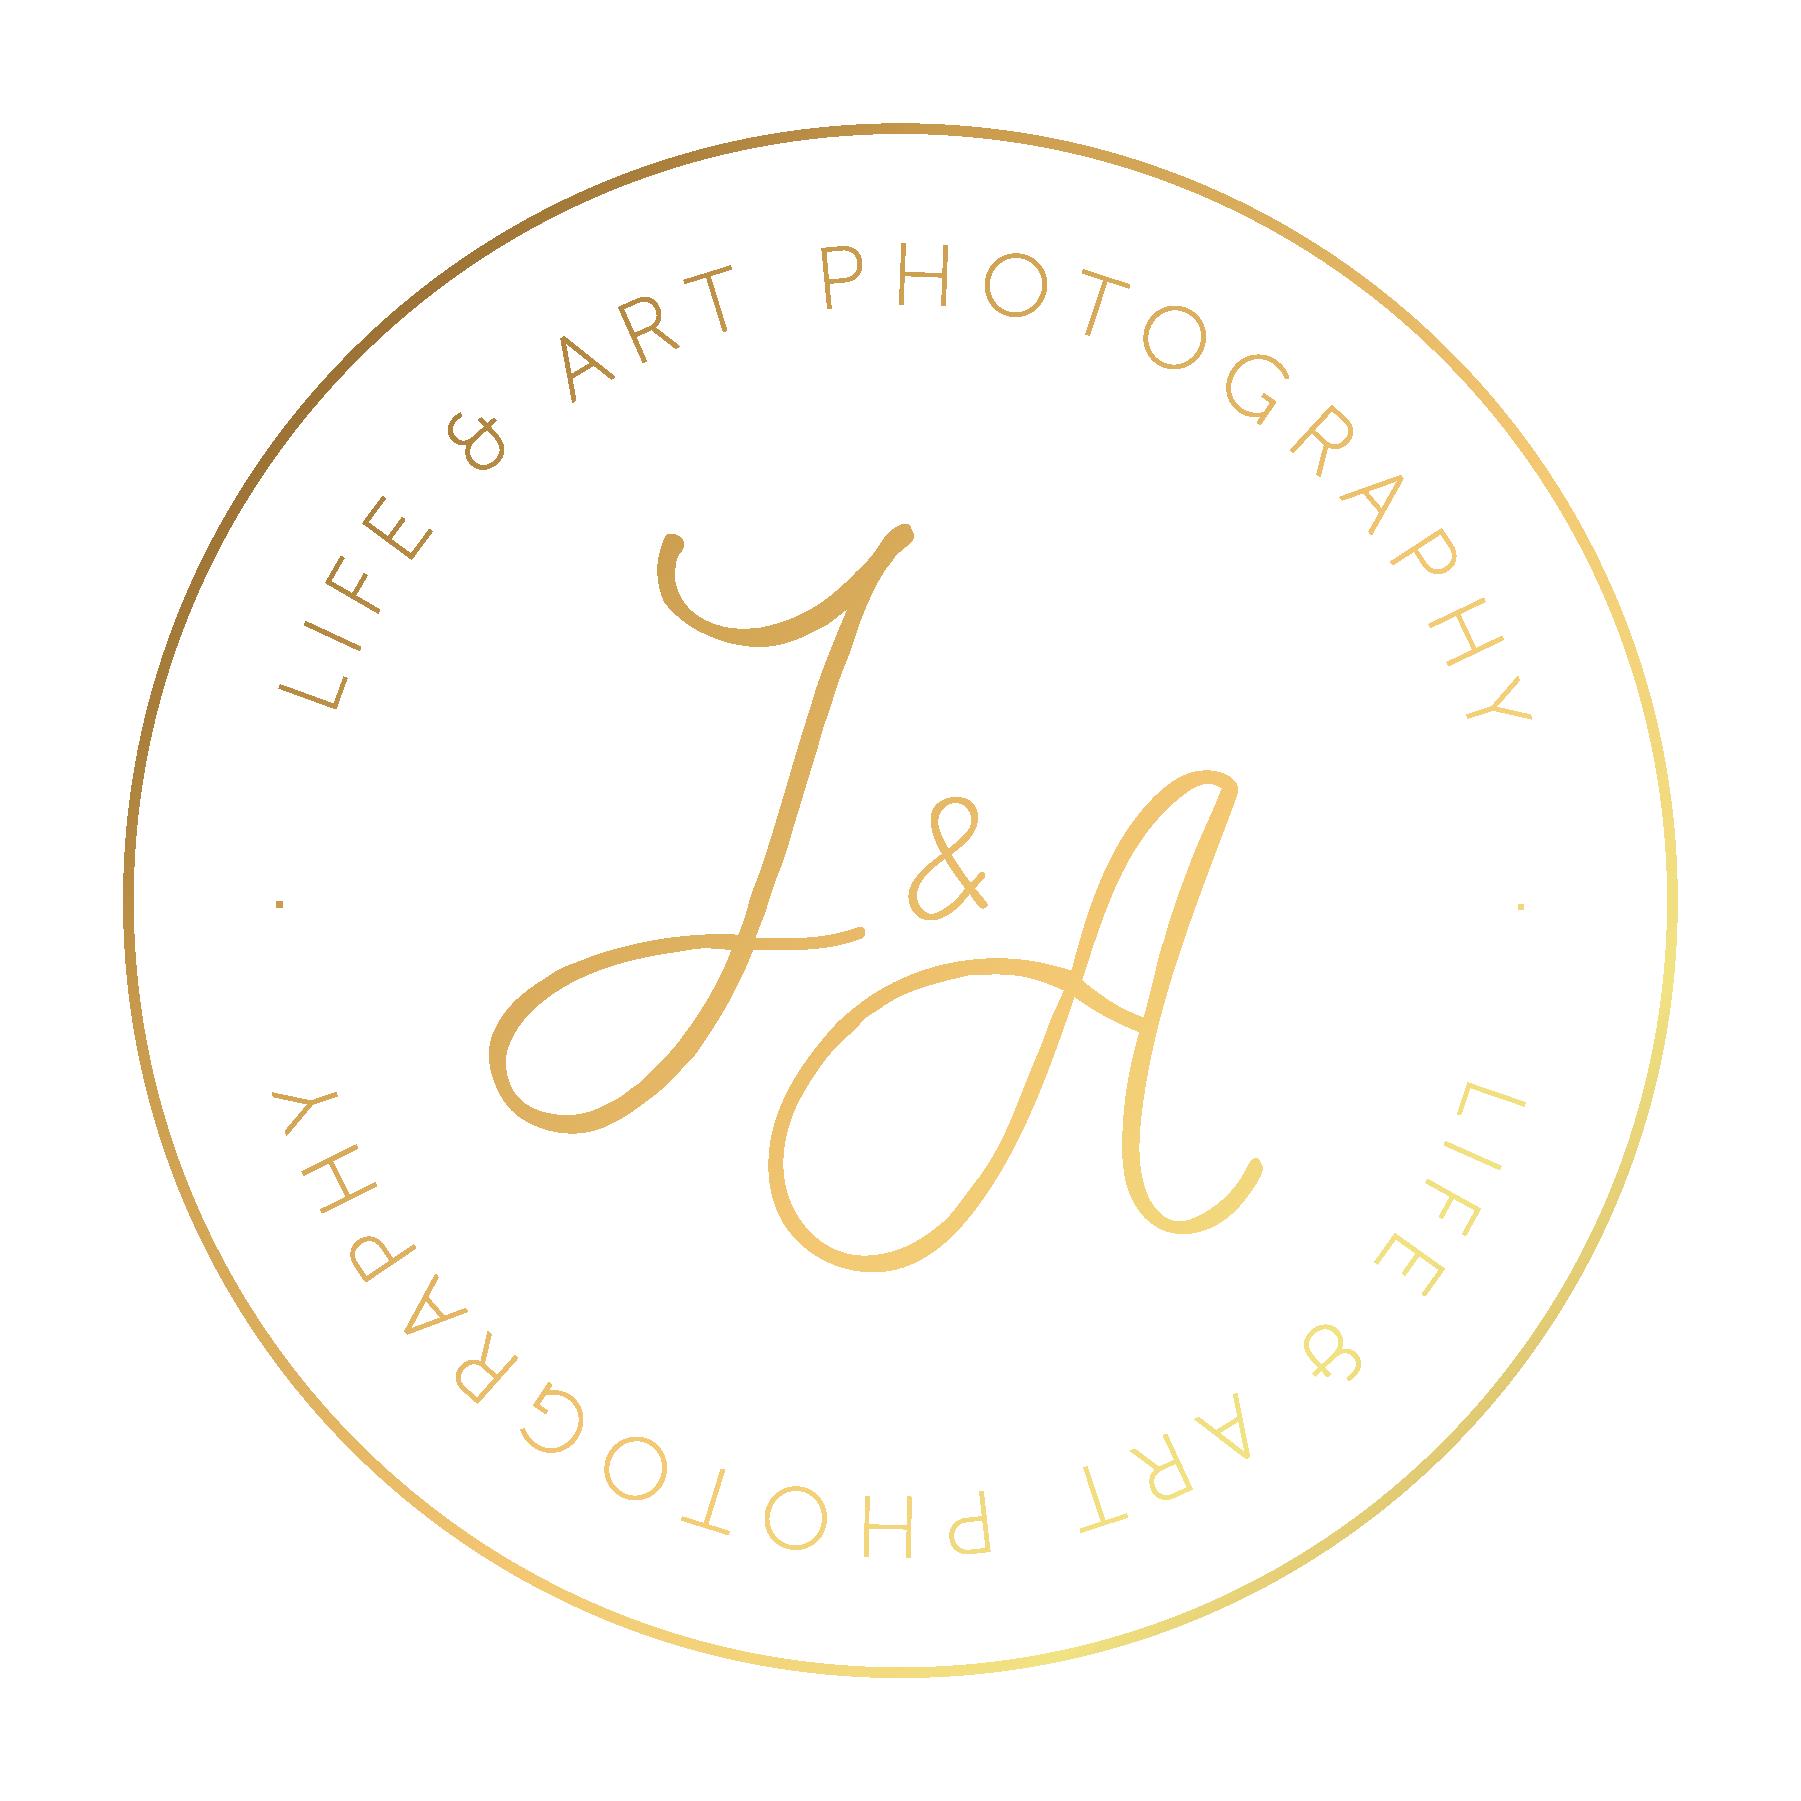 Boudoir Photographer in Minnesota | Life & Art Photography | Minneapolis-St. Paul